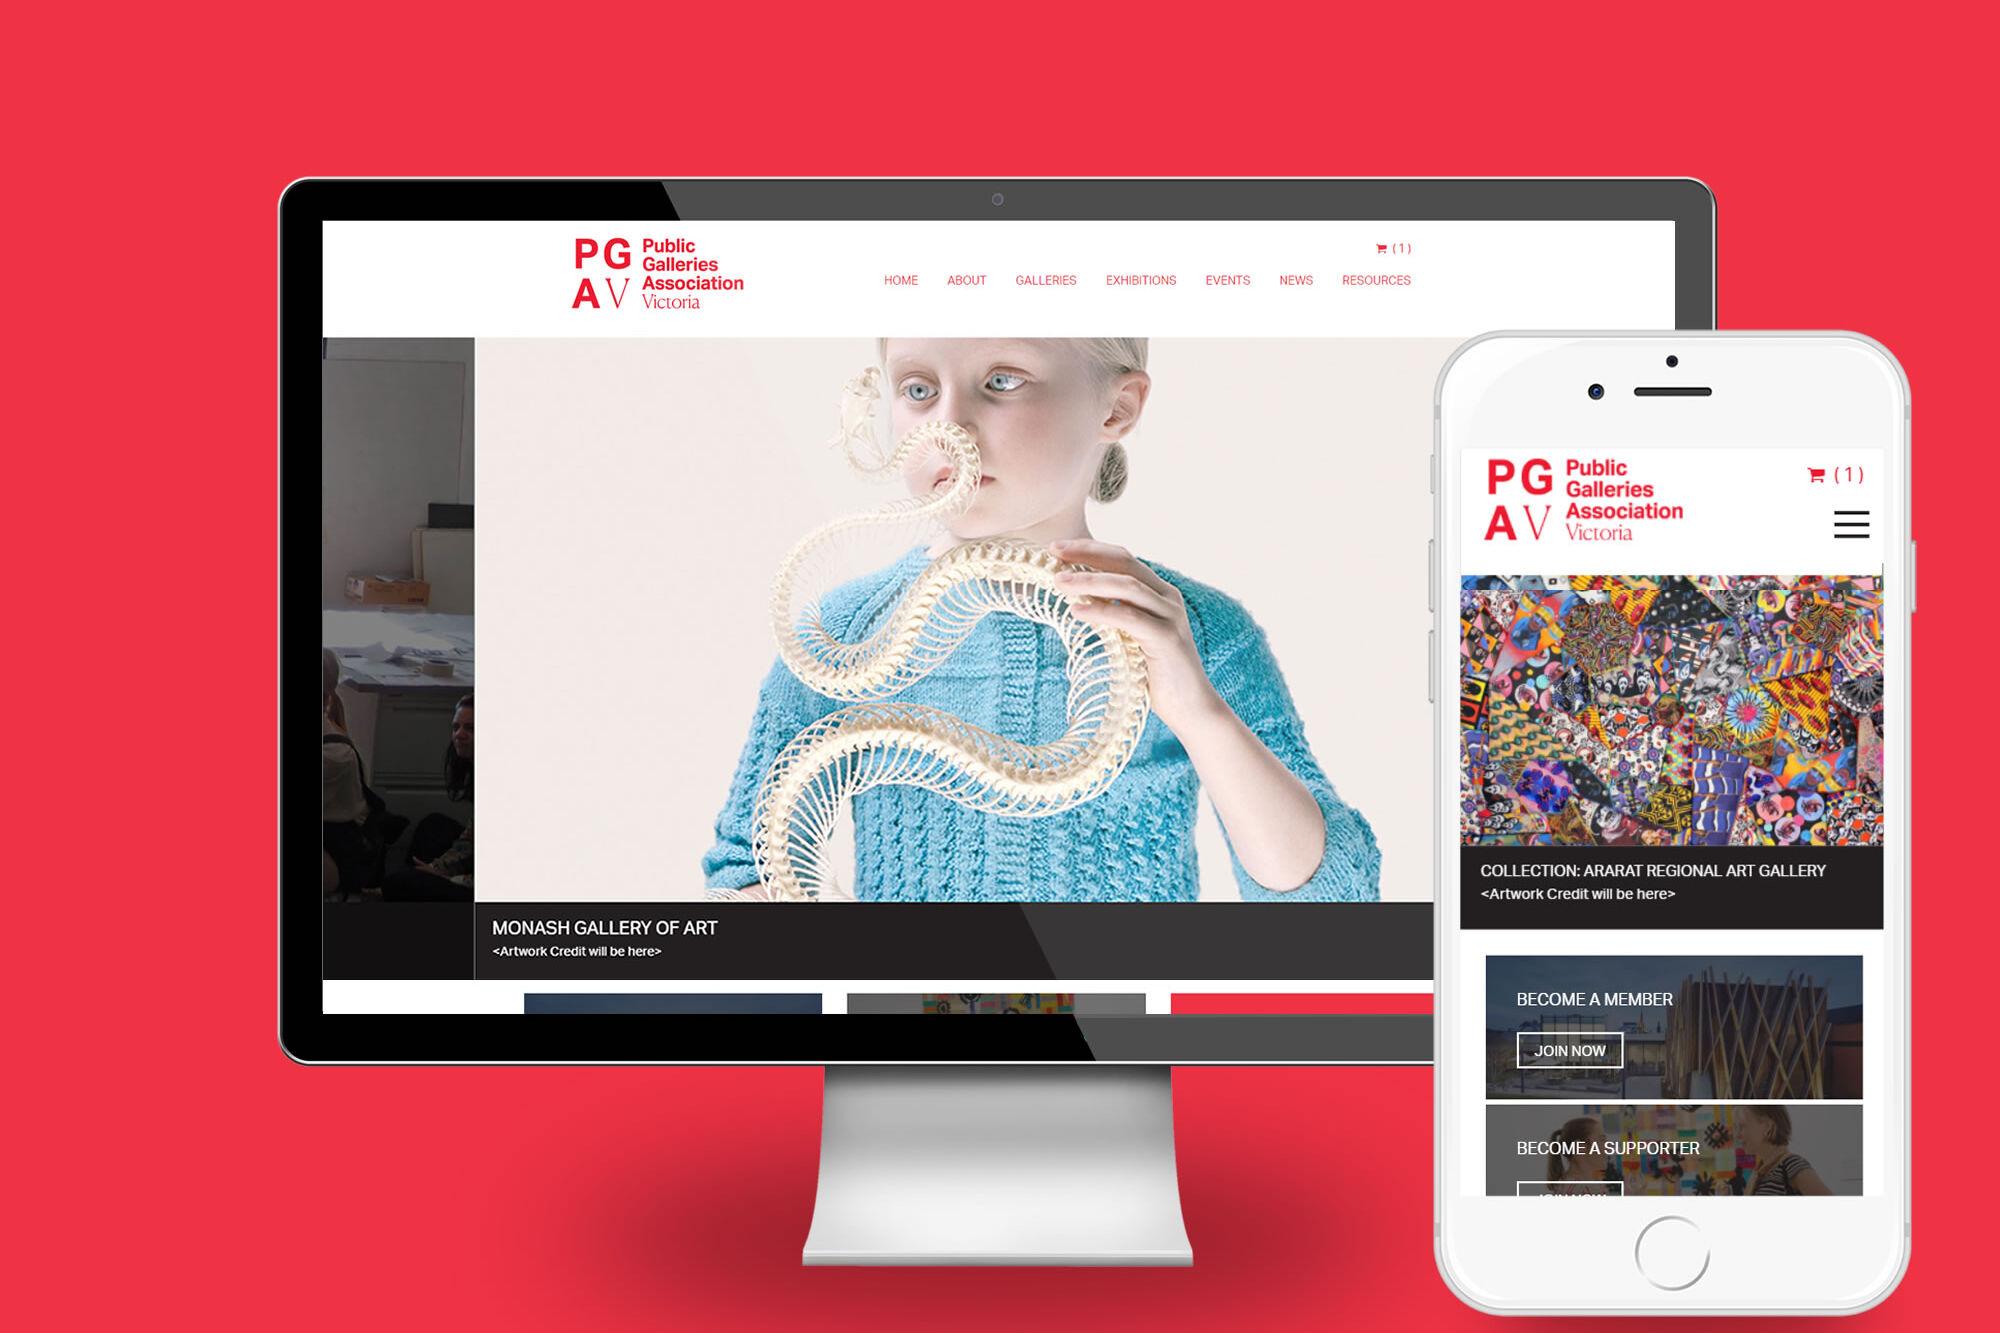 PGAV Desktop view